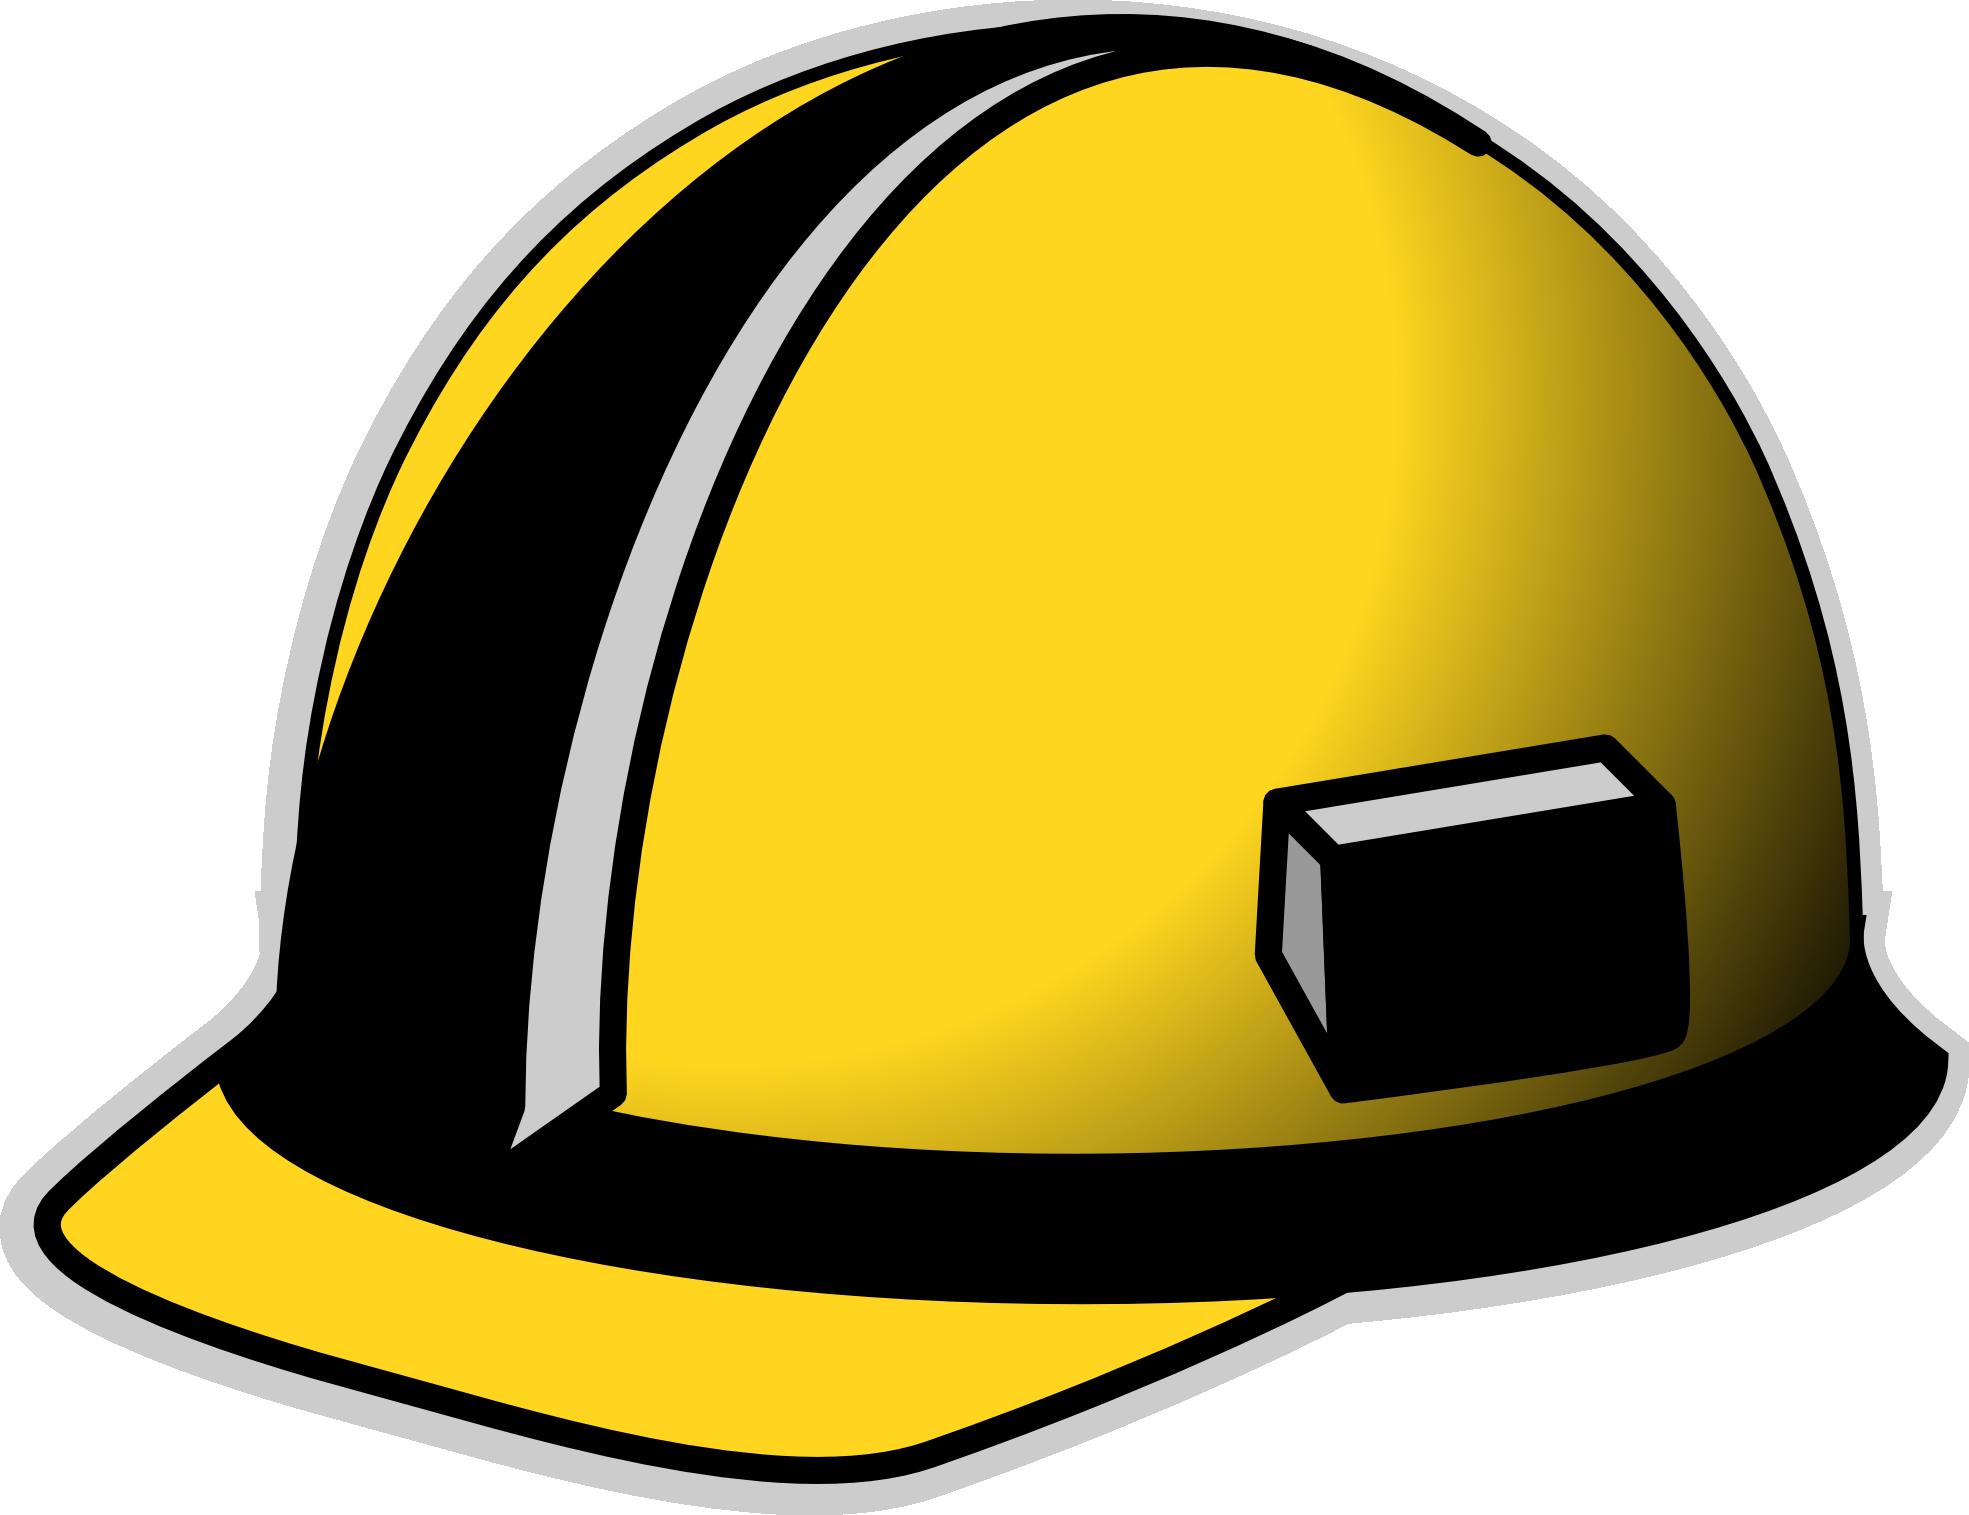 Construction Hat Clipart Clipart Panda Free Clipart Images